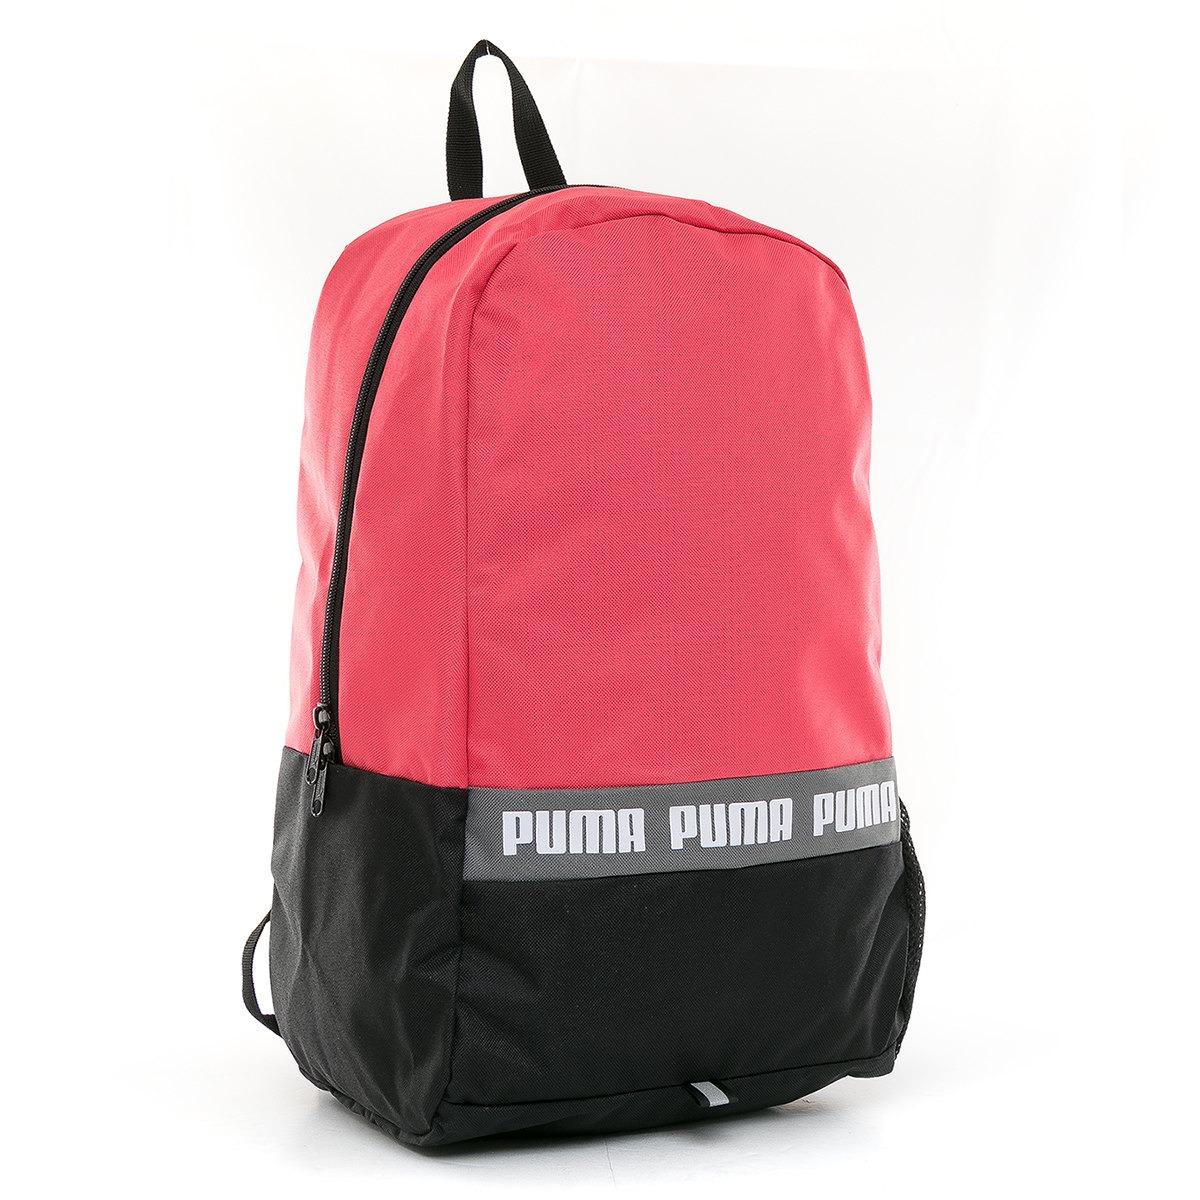 6920a6b229 Mochila Phase Ii Rosa Puma Puma Tienda Oficial - $ 489,00 en Mercado ...